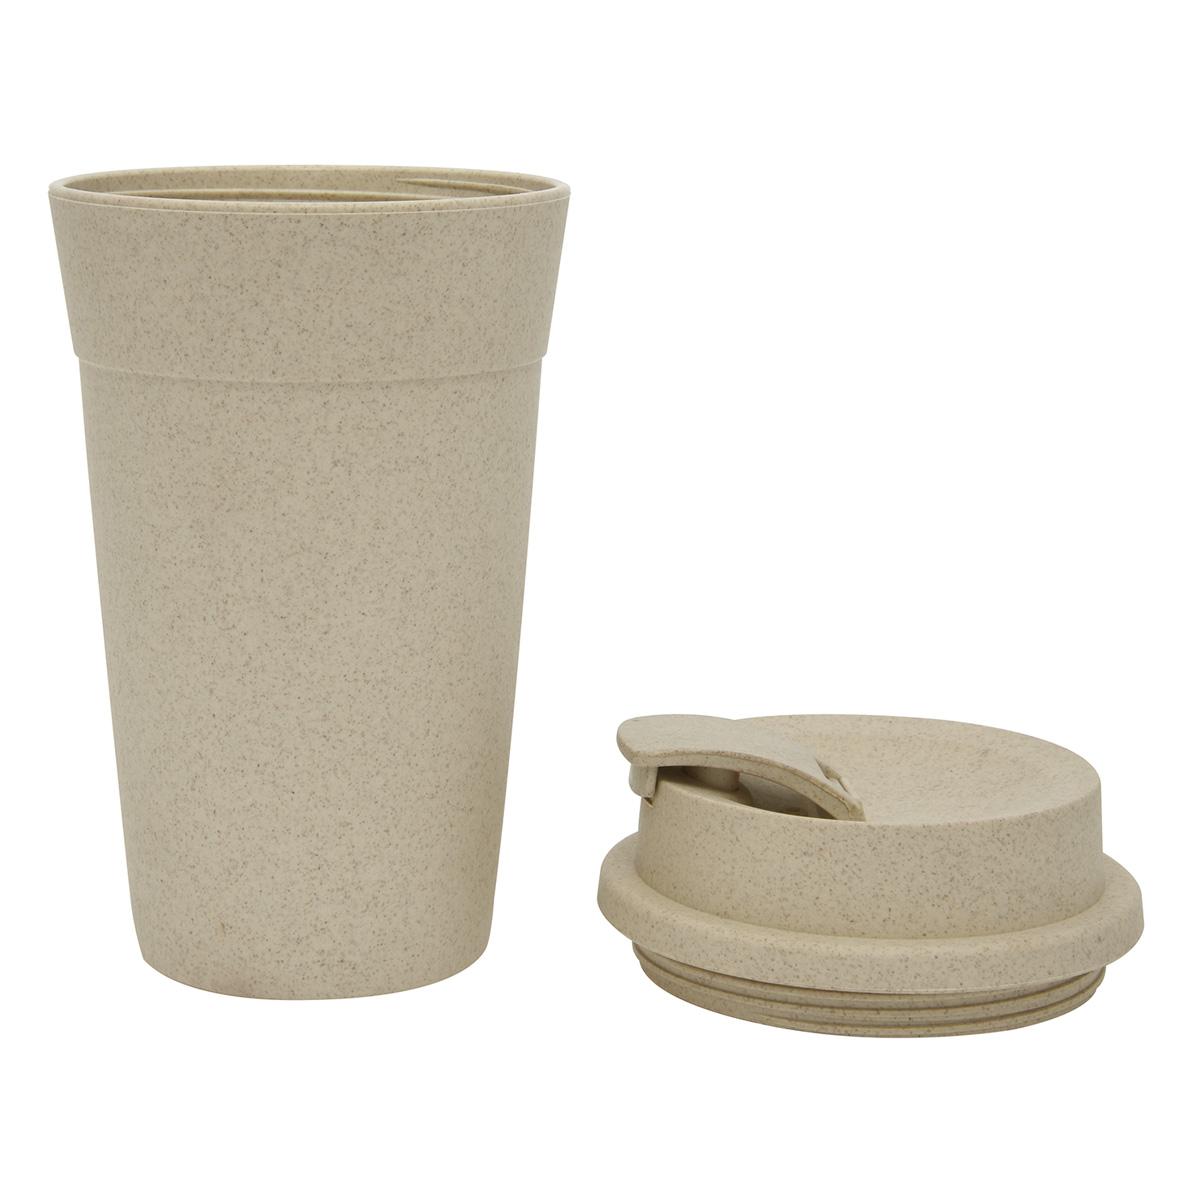 5378 - Vaso Térmico Ecológico Wheat Travel de 473 ml.